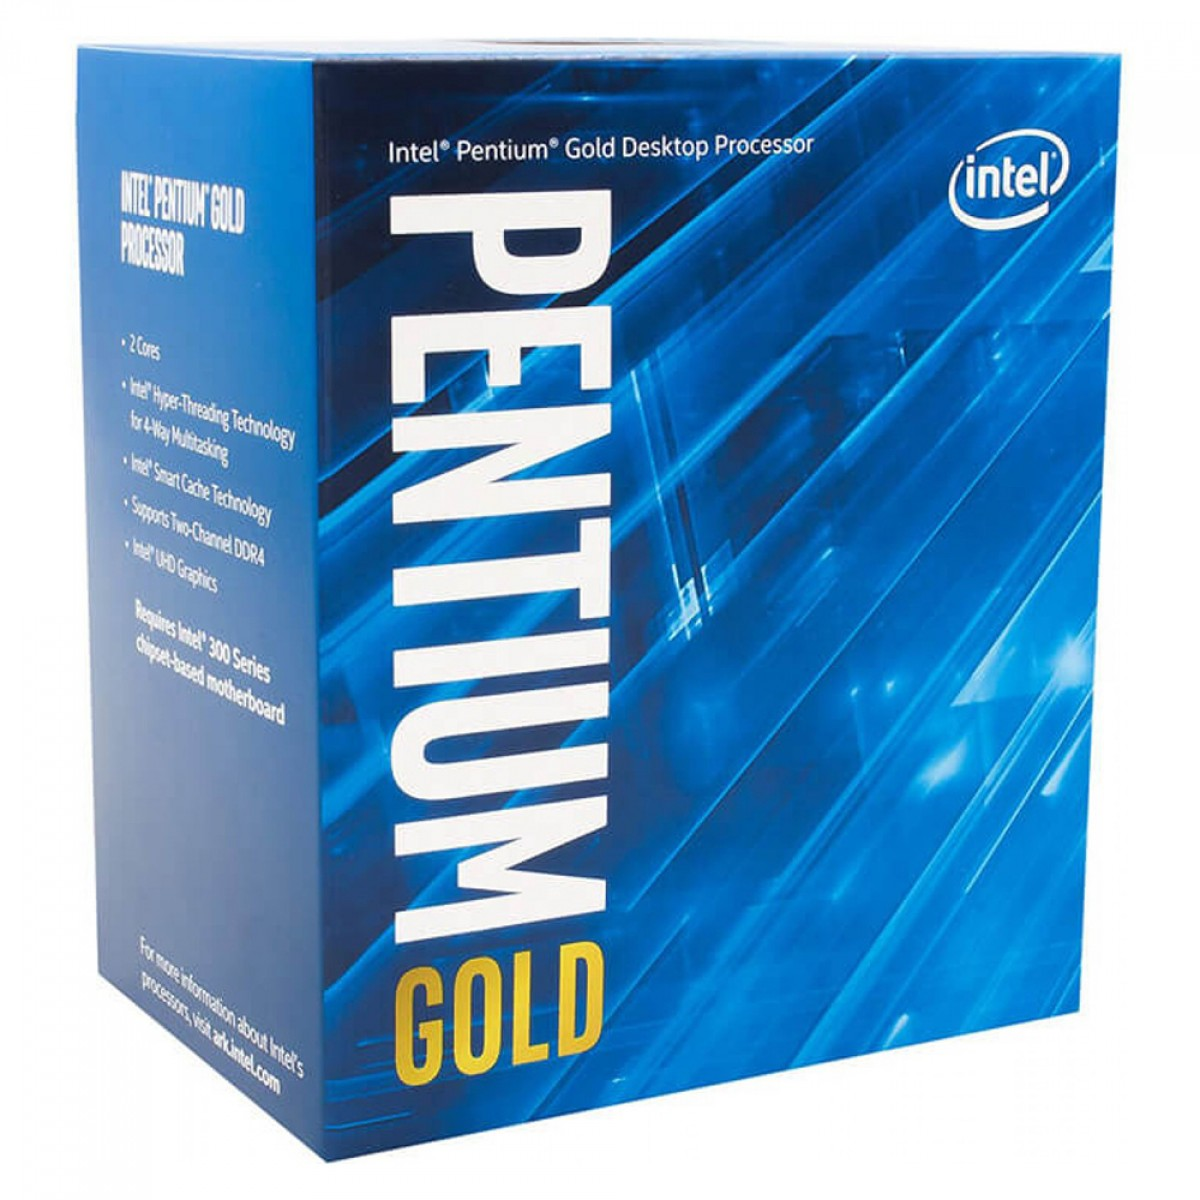 Kit Upgrade, Asus Prime H310M-E + Intel Pentium Gold G5420 + 4GB DDR4 2666MHz